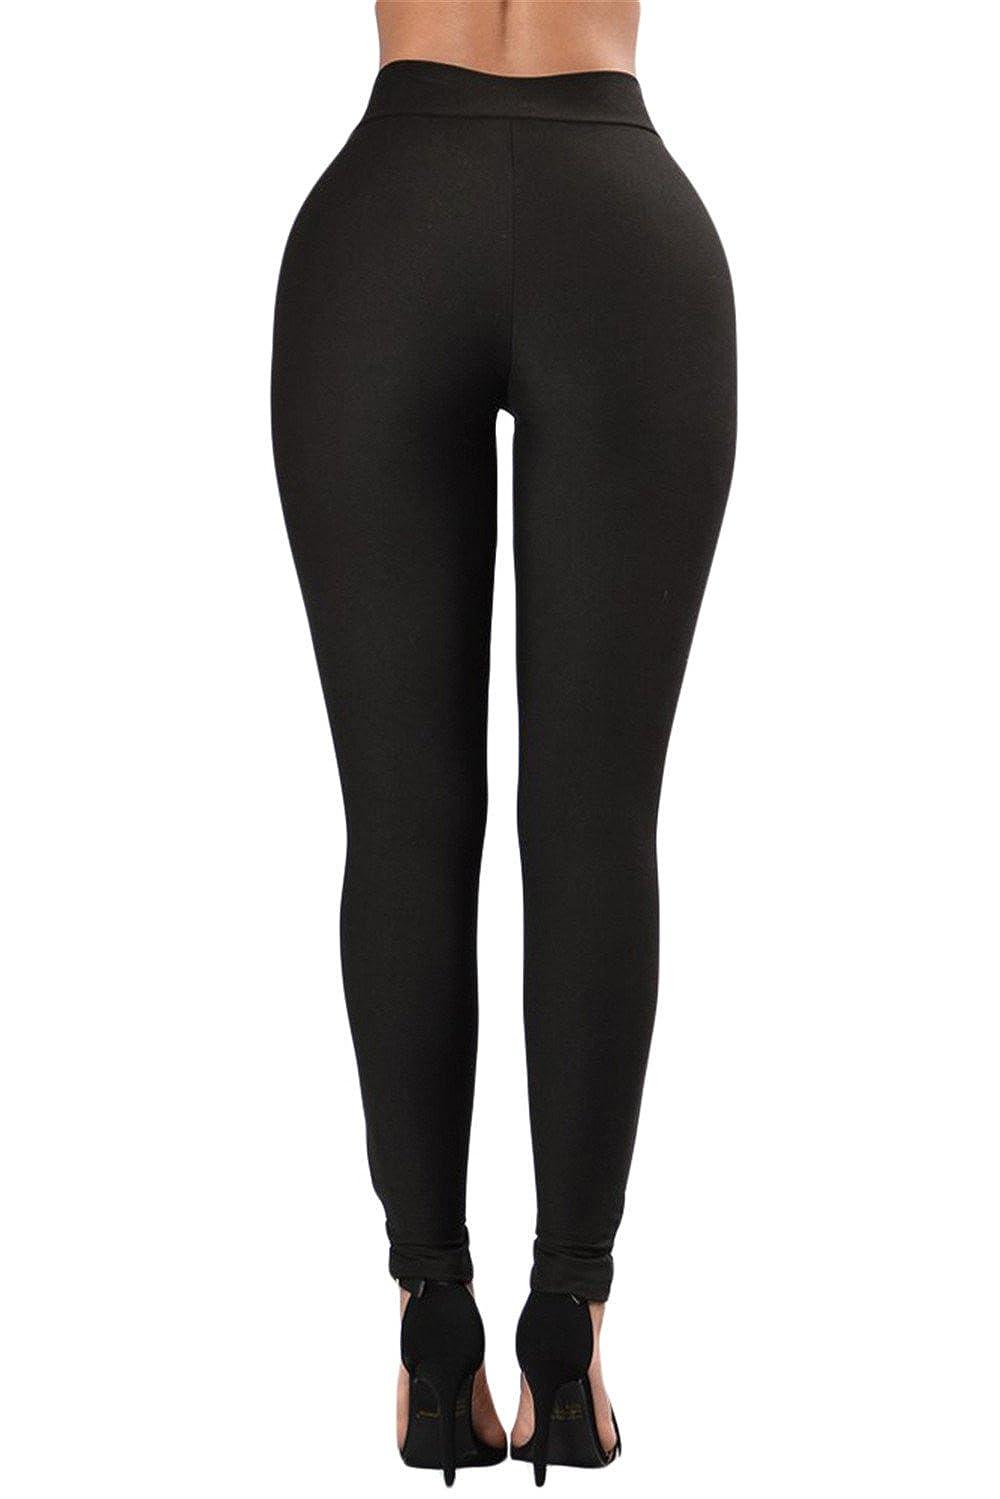 4942b9286216e2 Mushuji Women Black Grommet Lace Up Crisscross Front High Waist Stretch  Sports Leggings Slim Fit Yoga Pants Running Leggings at Amazon Women's  Clothing ...